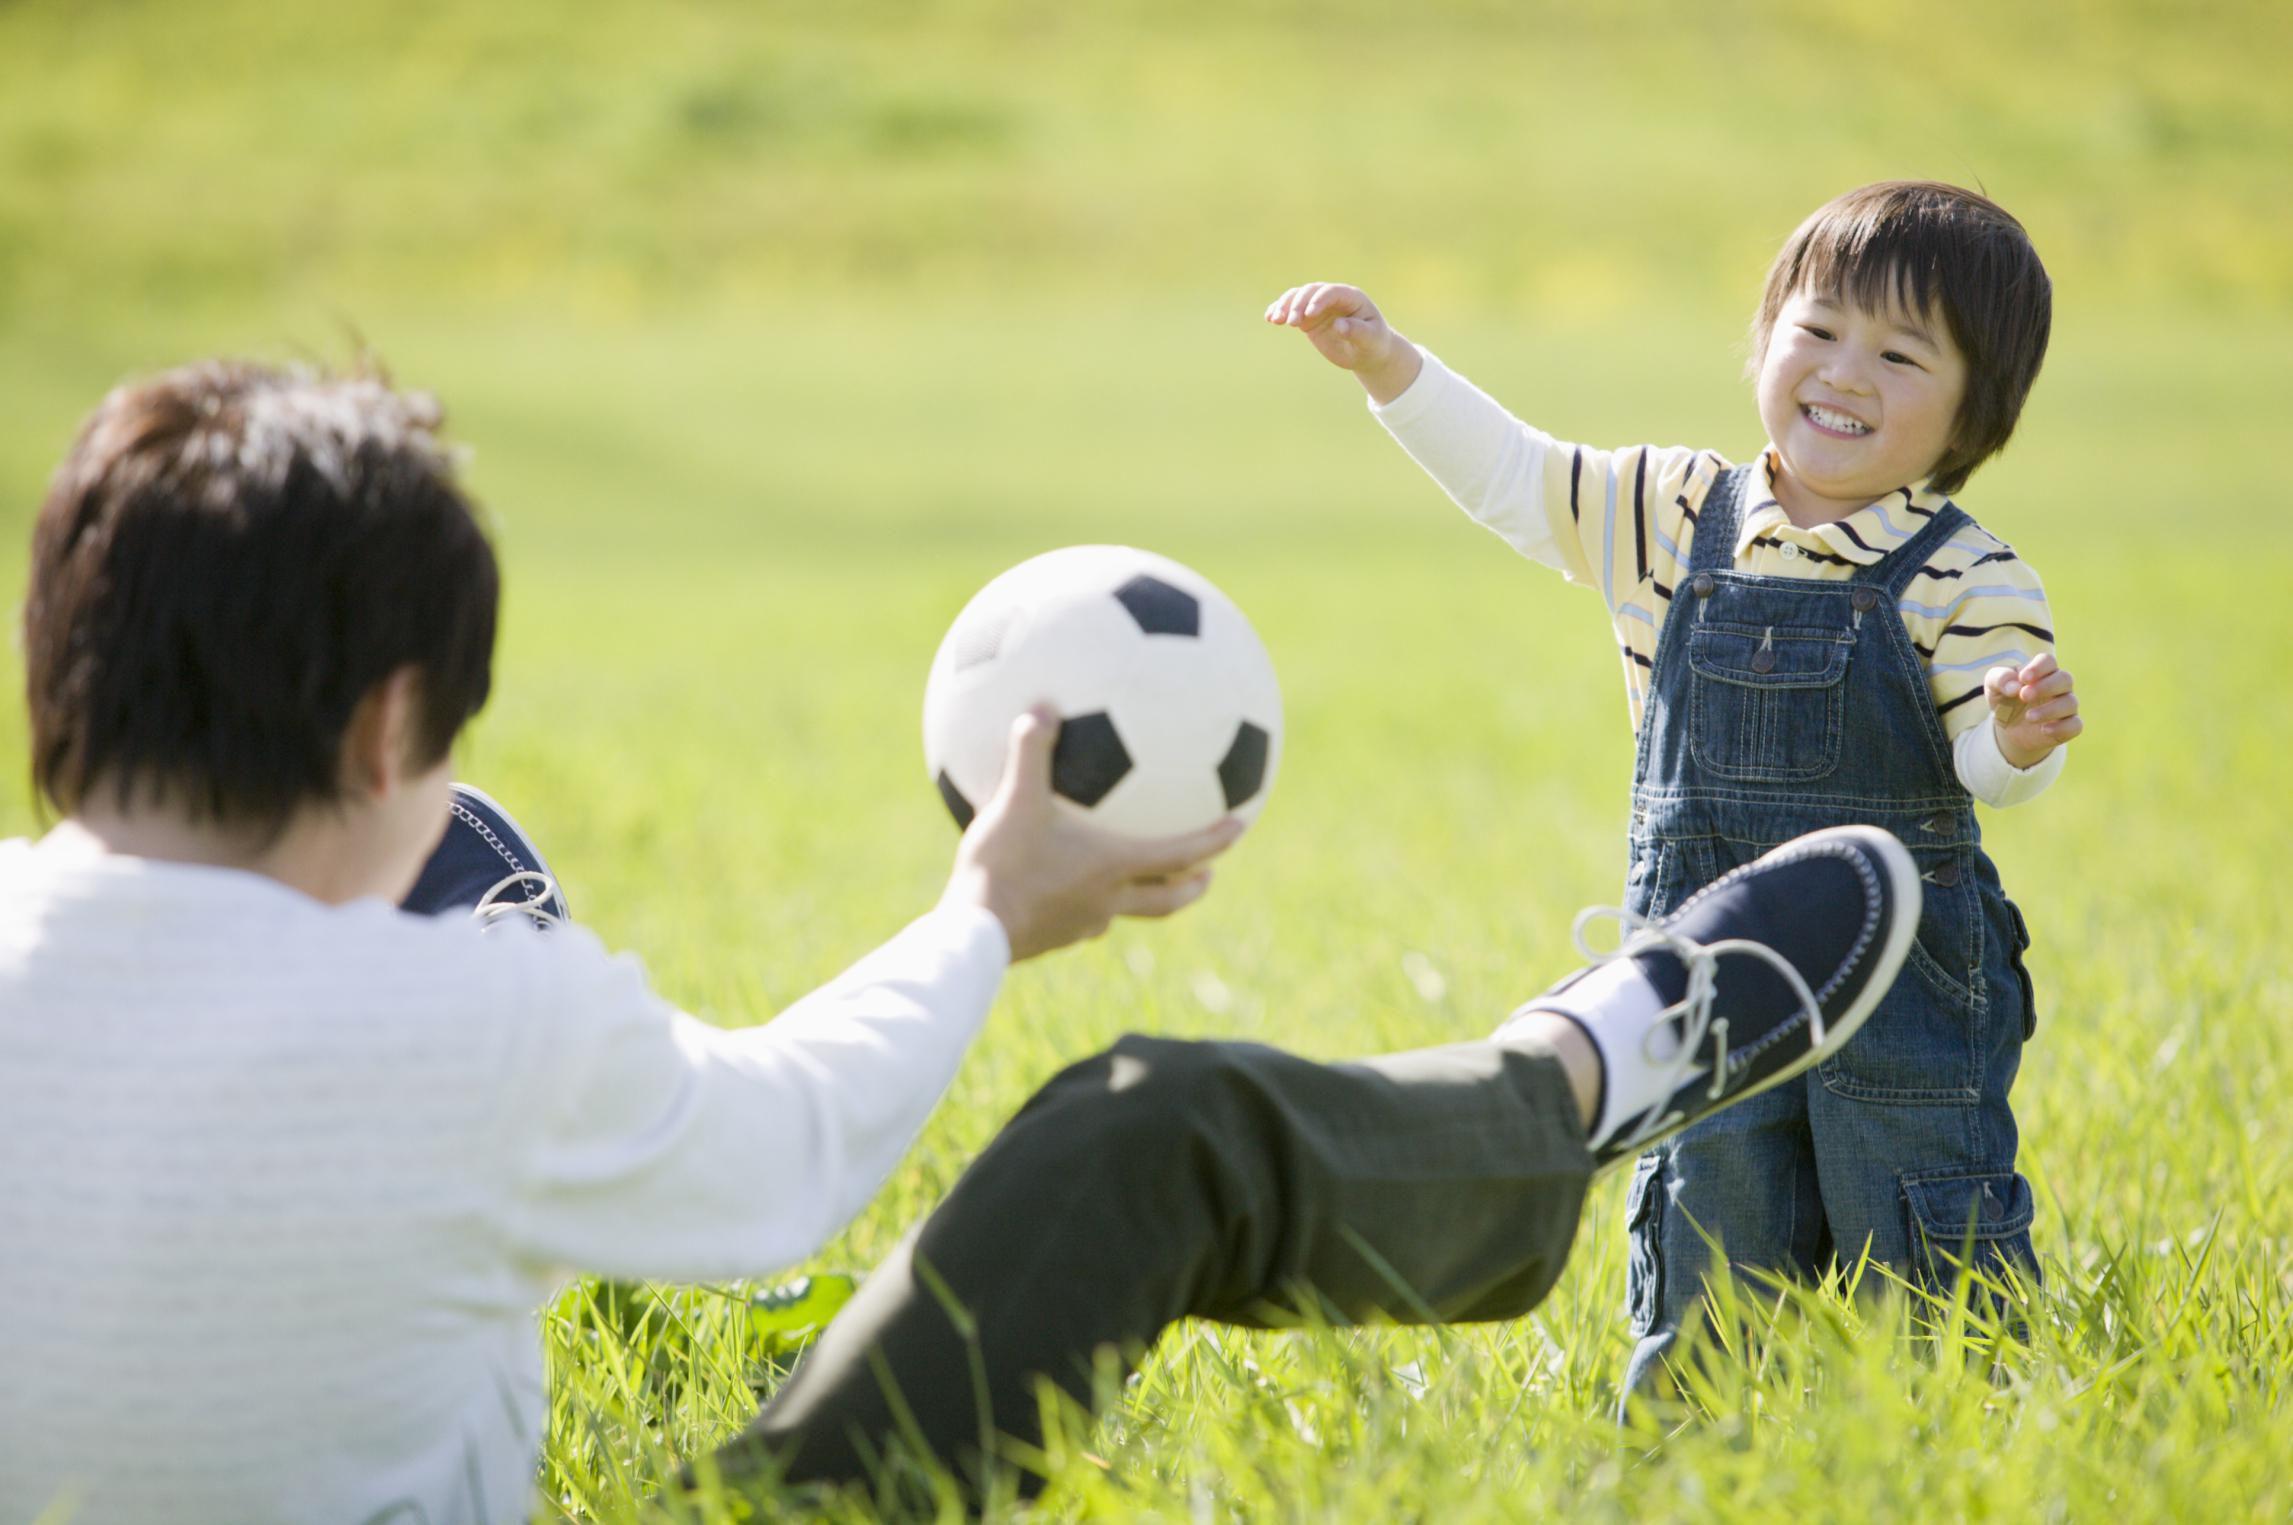 kickball games and variations